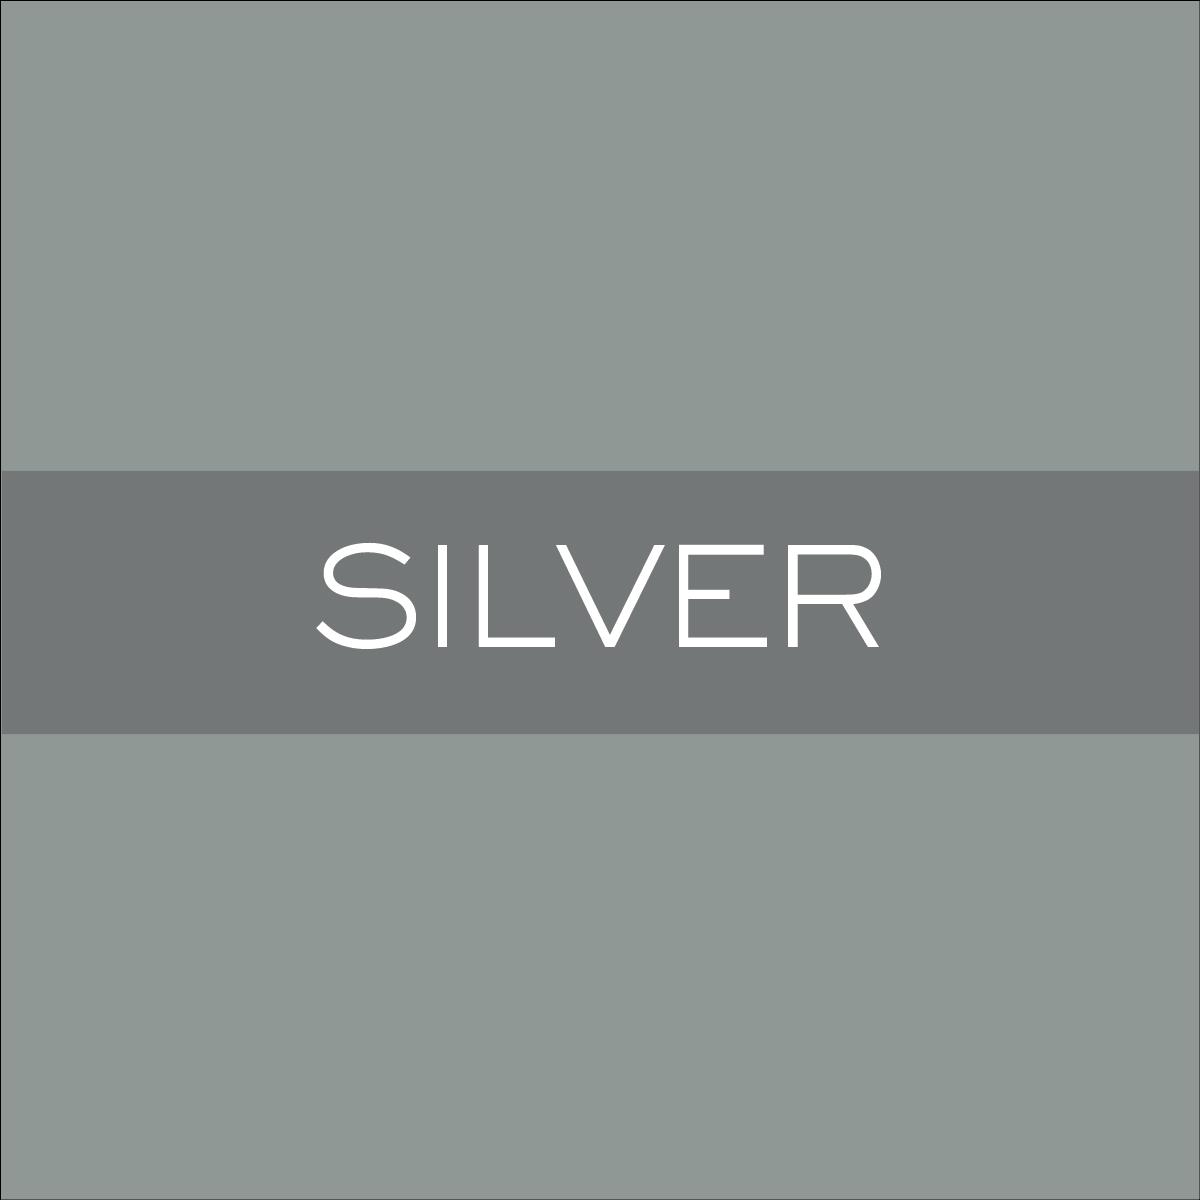 INK_Silver.jpg